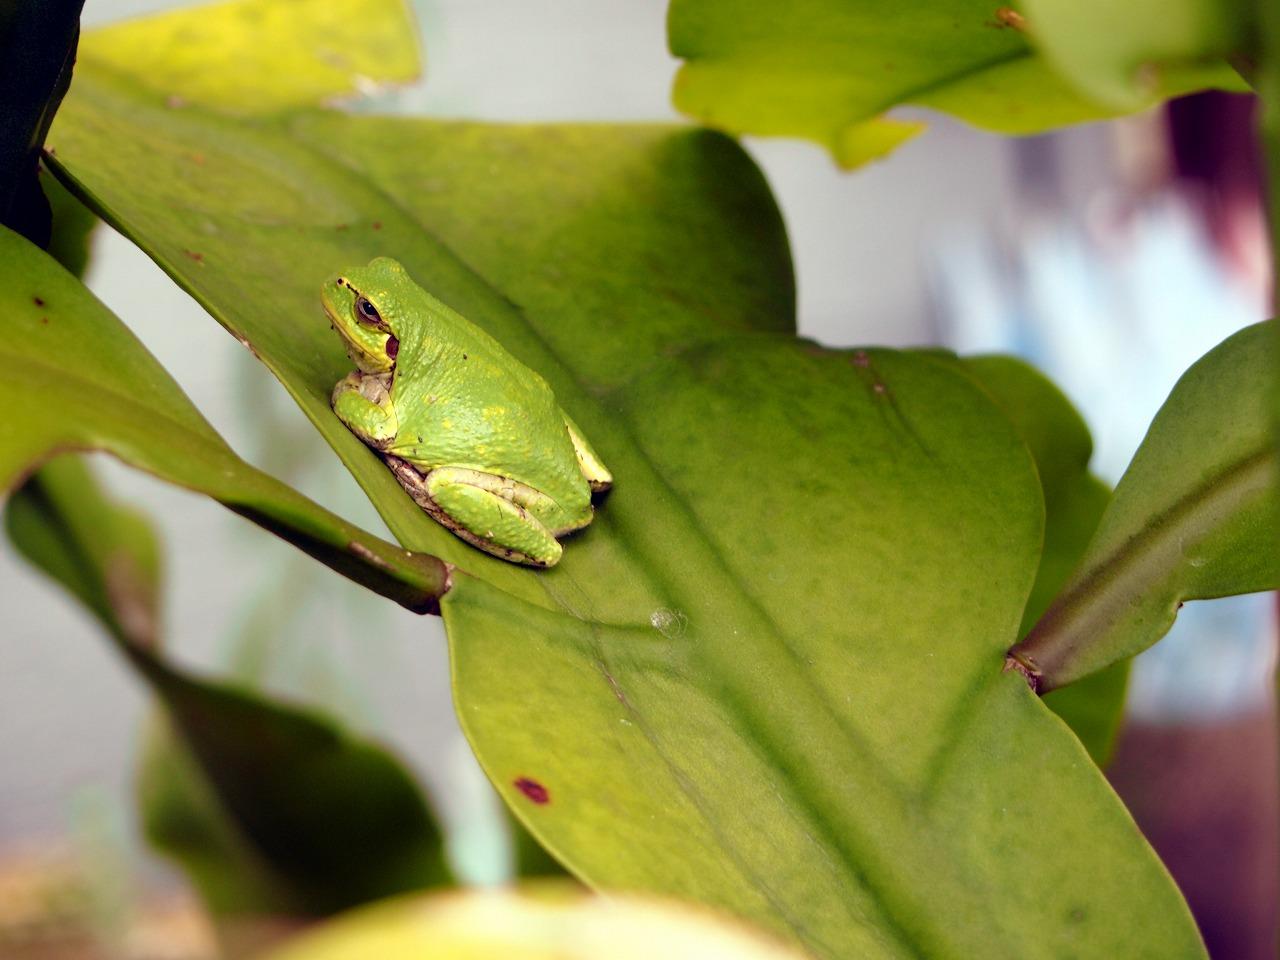 Frog_20140802-01.jpg